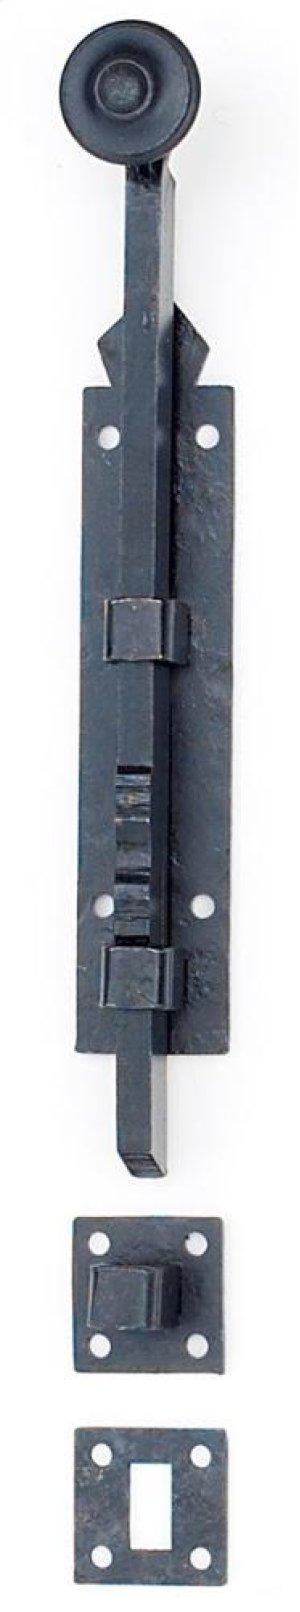 Surface Bolt Wrought Iron Product Image